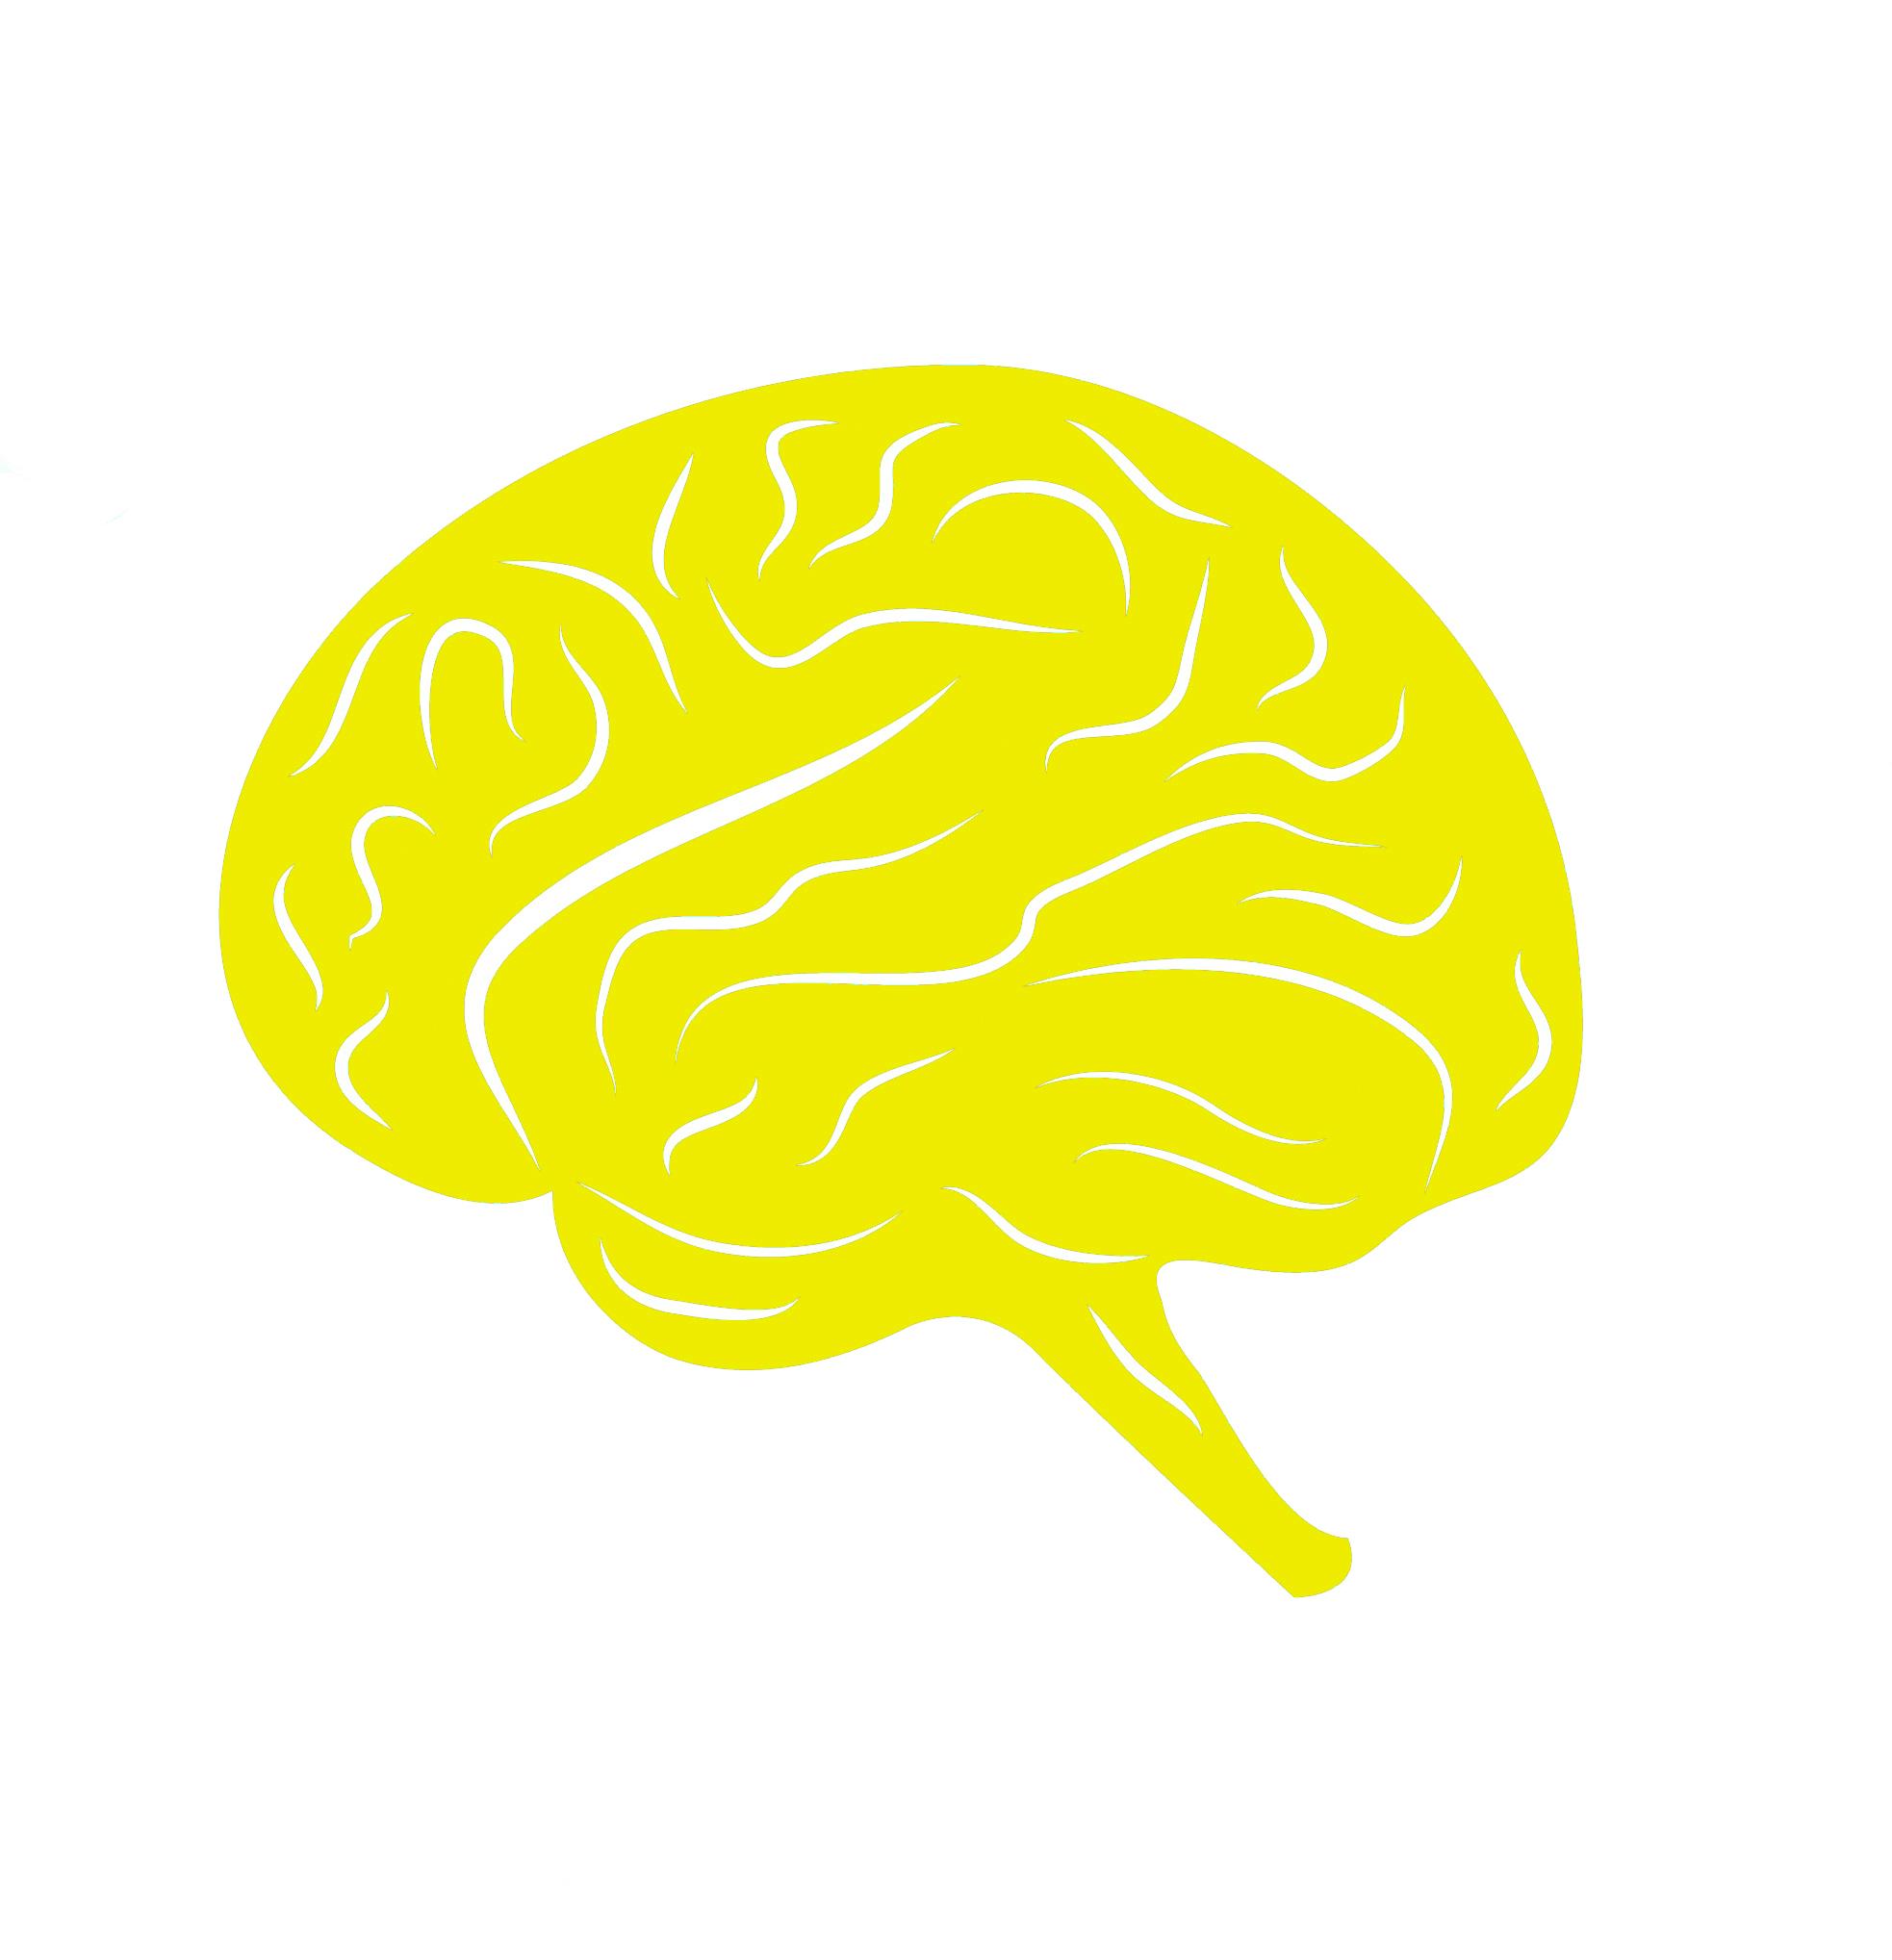 51921082_thumbnail brain y.jpg